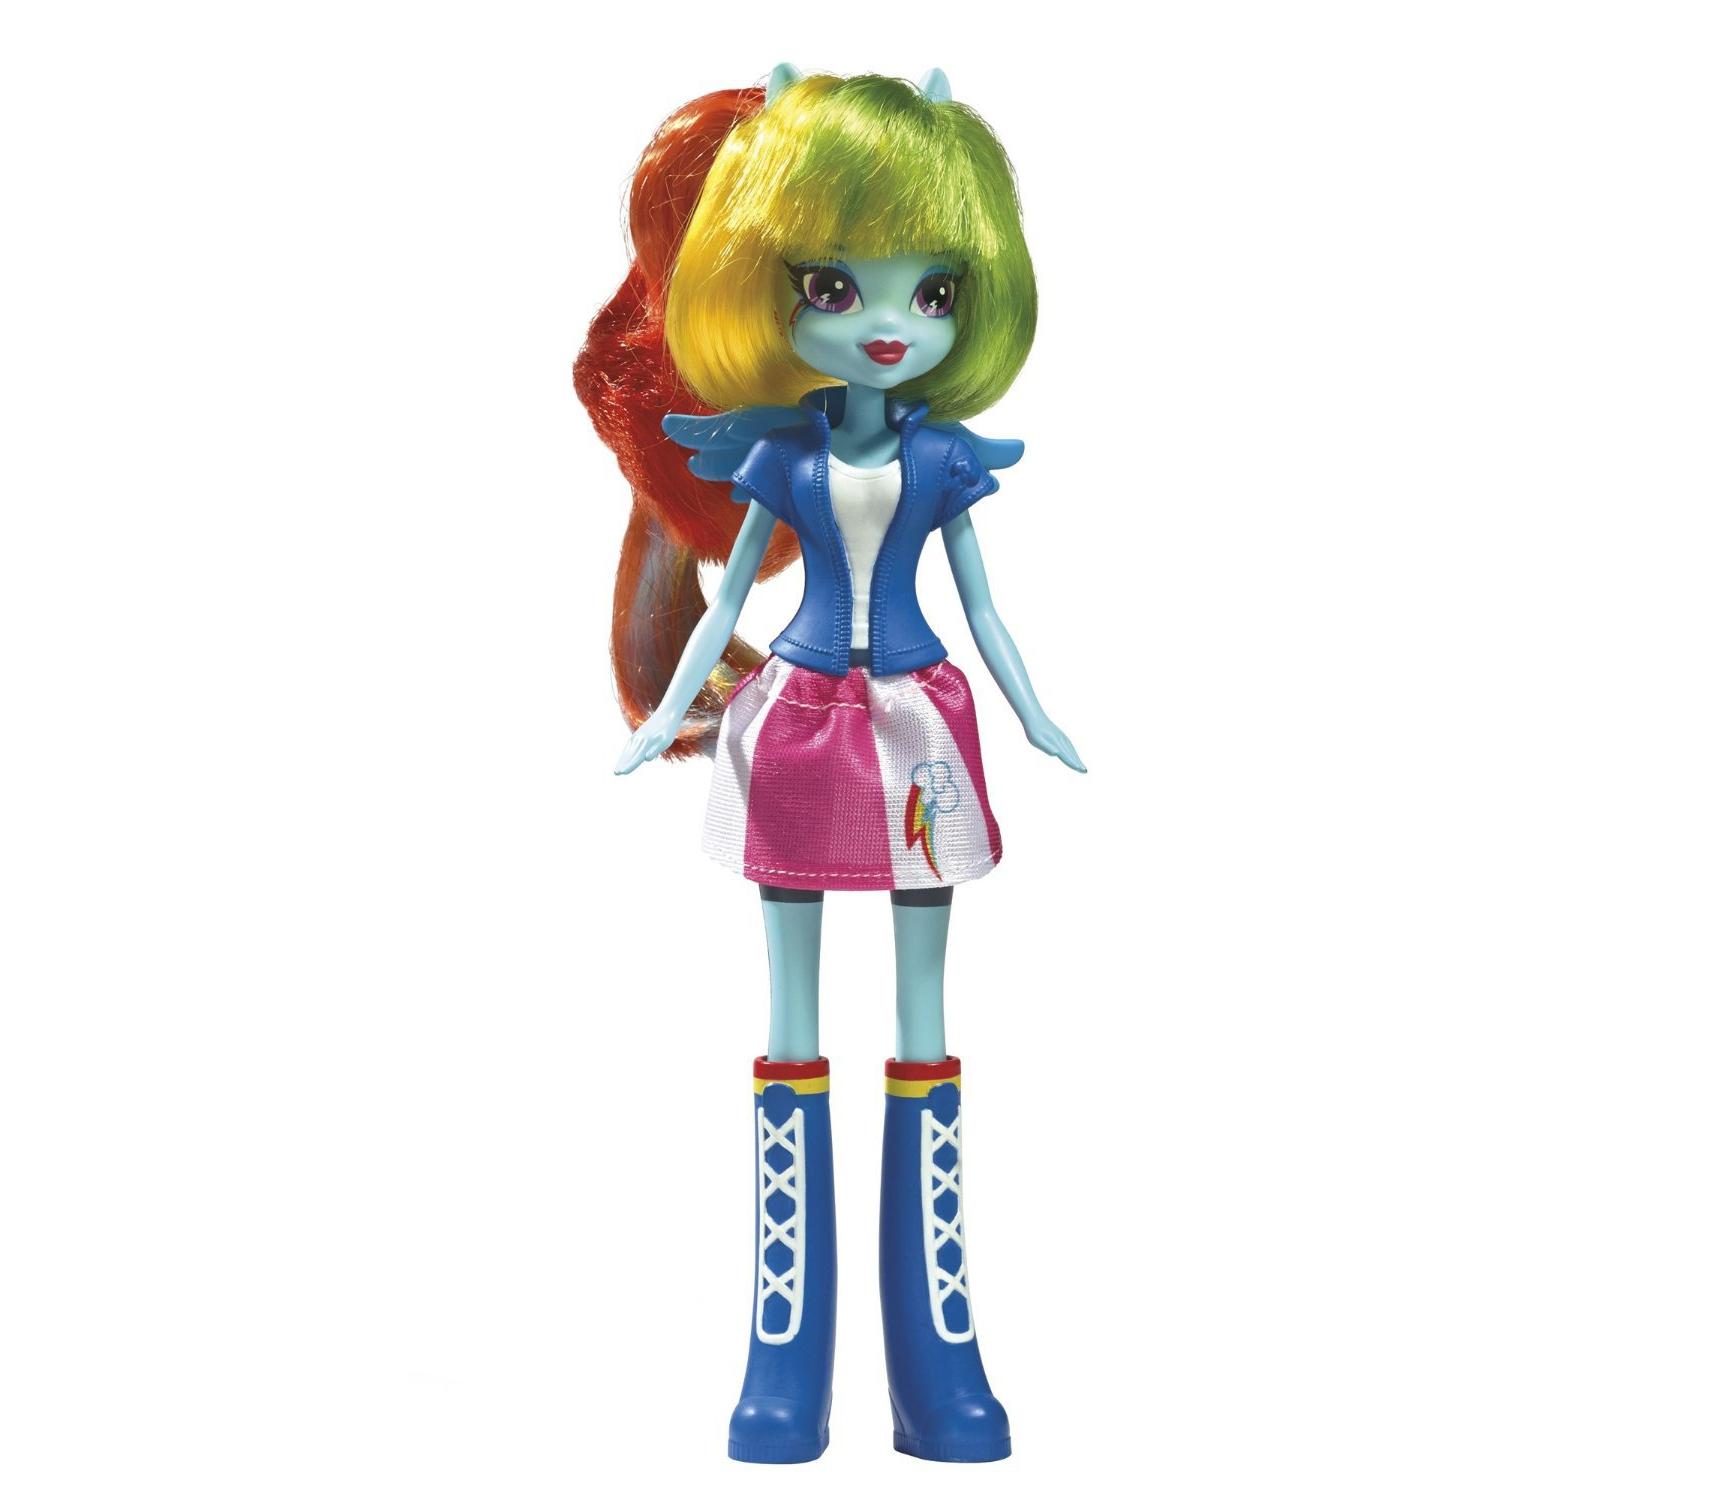 Эквестрия герлз кукла радуга картинки